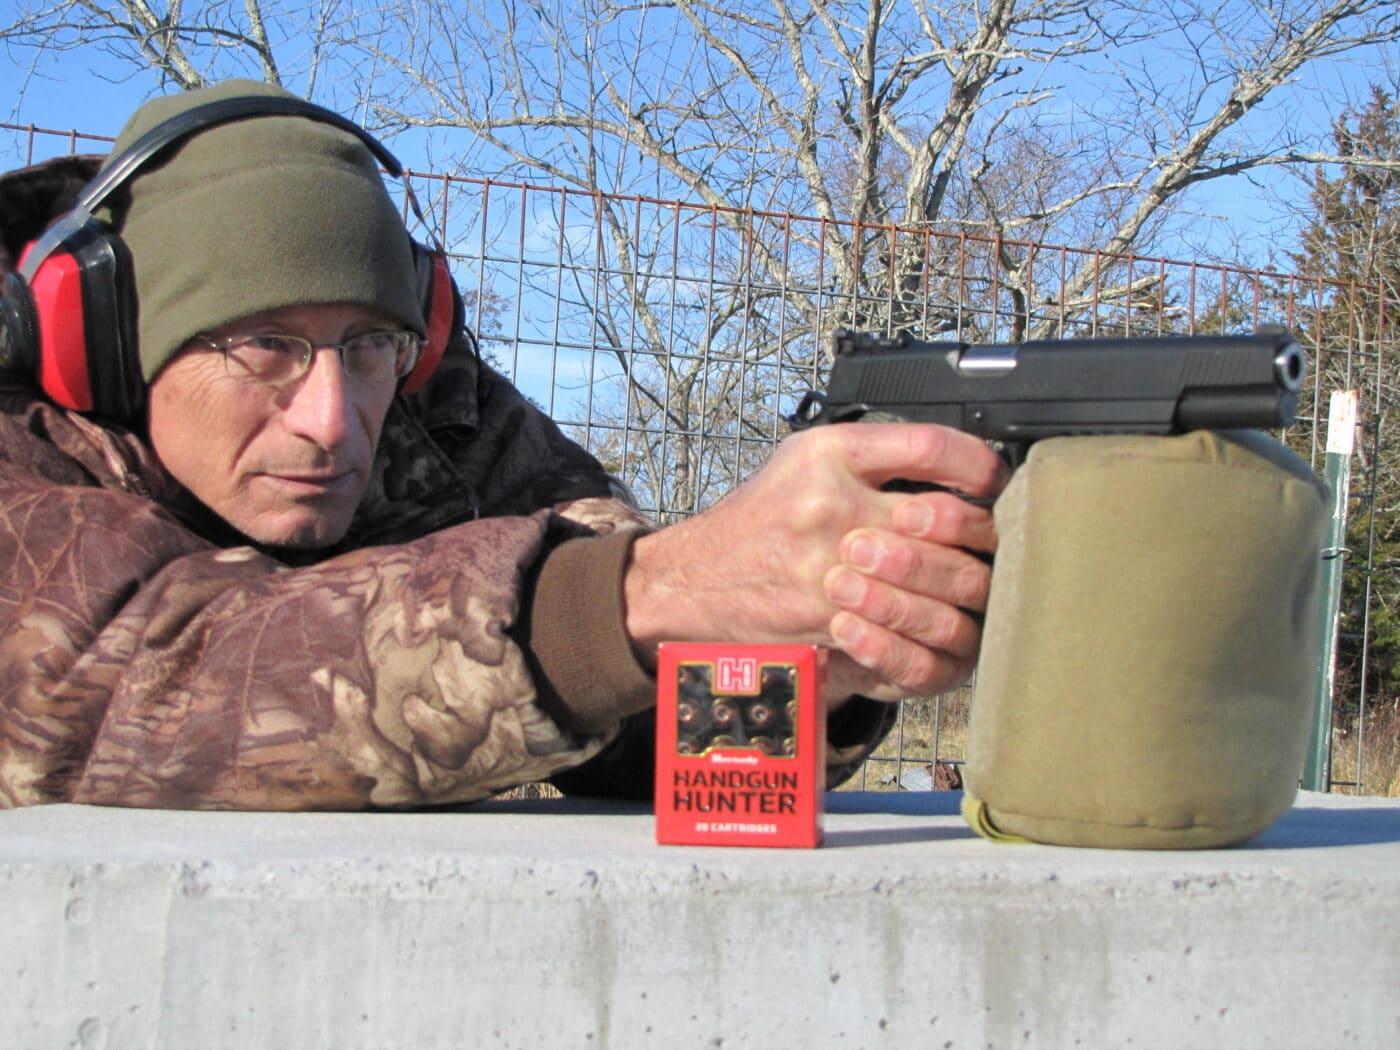 Man range testing the Hornady Handgun Hunter ammo